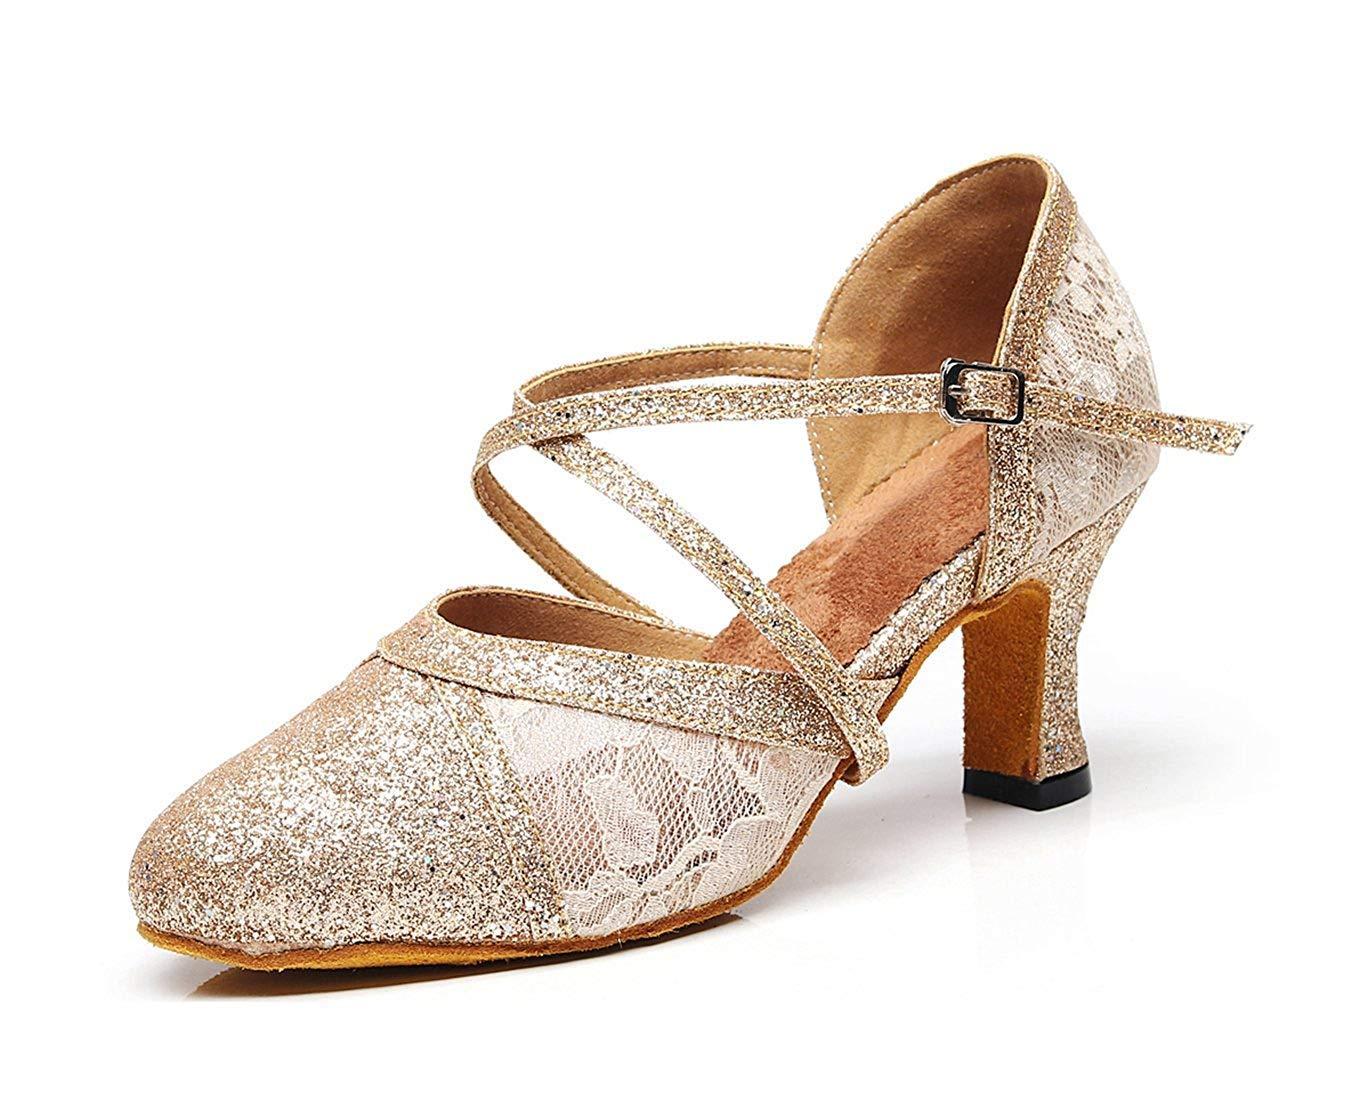 Qiusa Damen Cross Strap Light Gold Spitze Salsa Latin Formale Dancing Schuhe Formale Latin Partei Pumps UK 5 (Farbe   - Größe   -) 6ed460